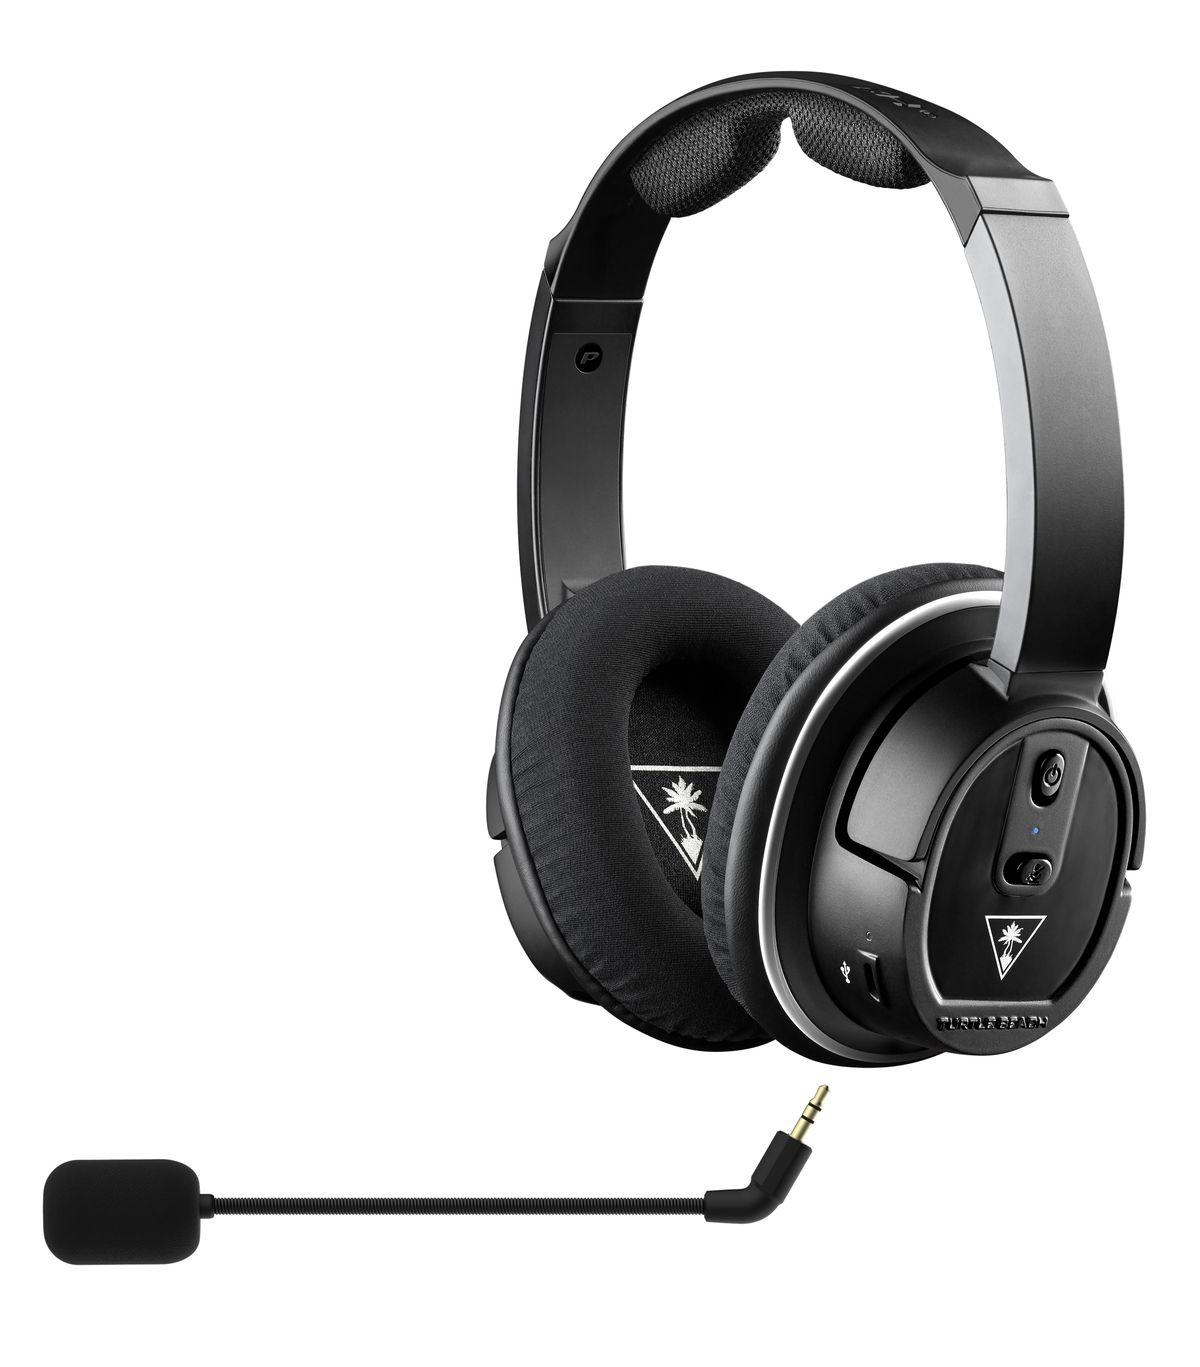 Headphones with detachable microphone